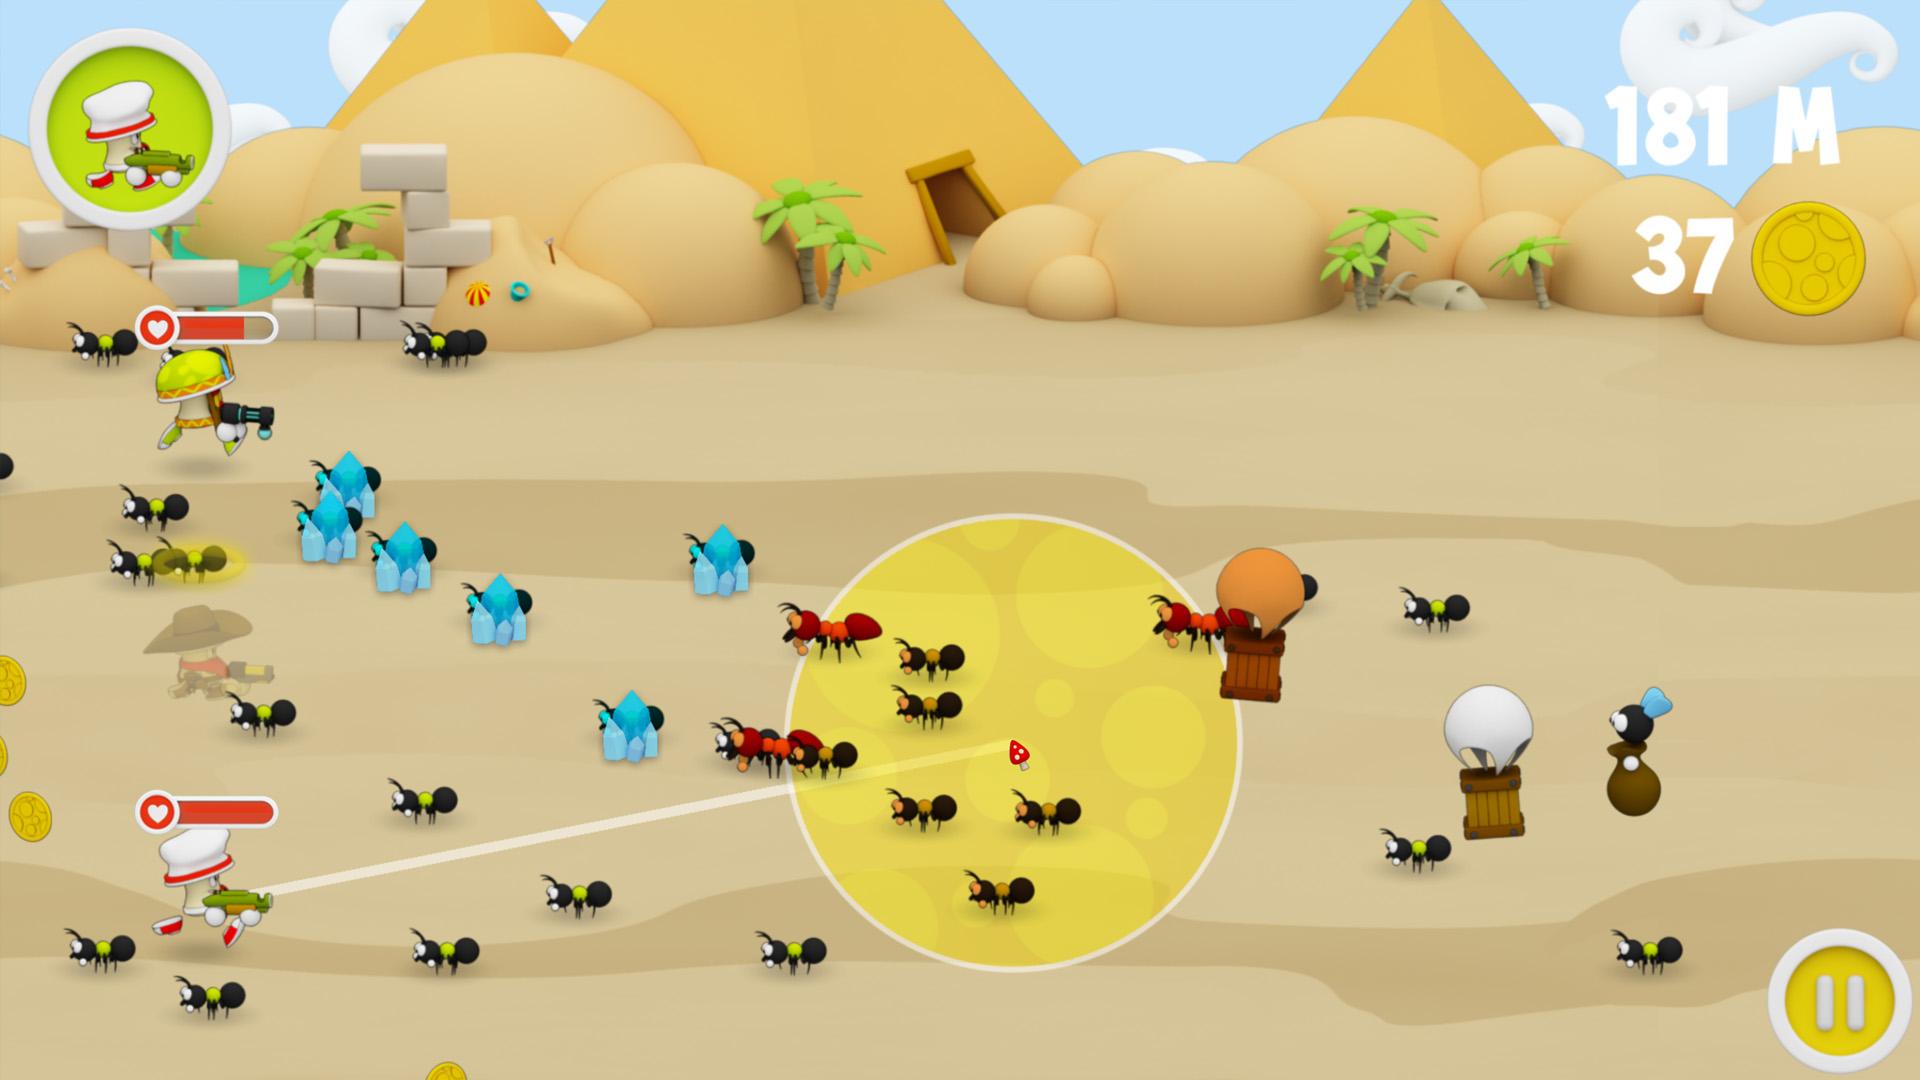 Wacky Spores: The Chase desert screenshot